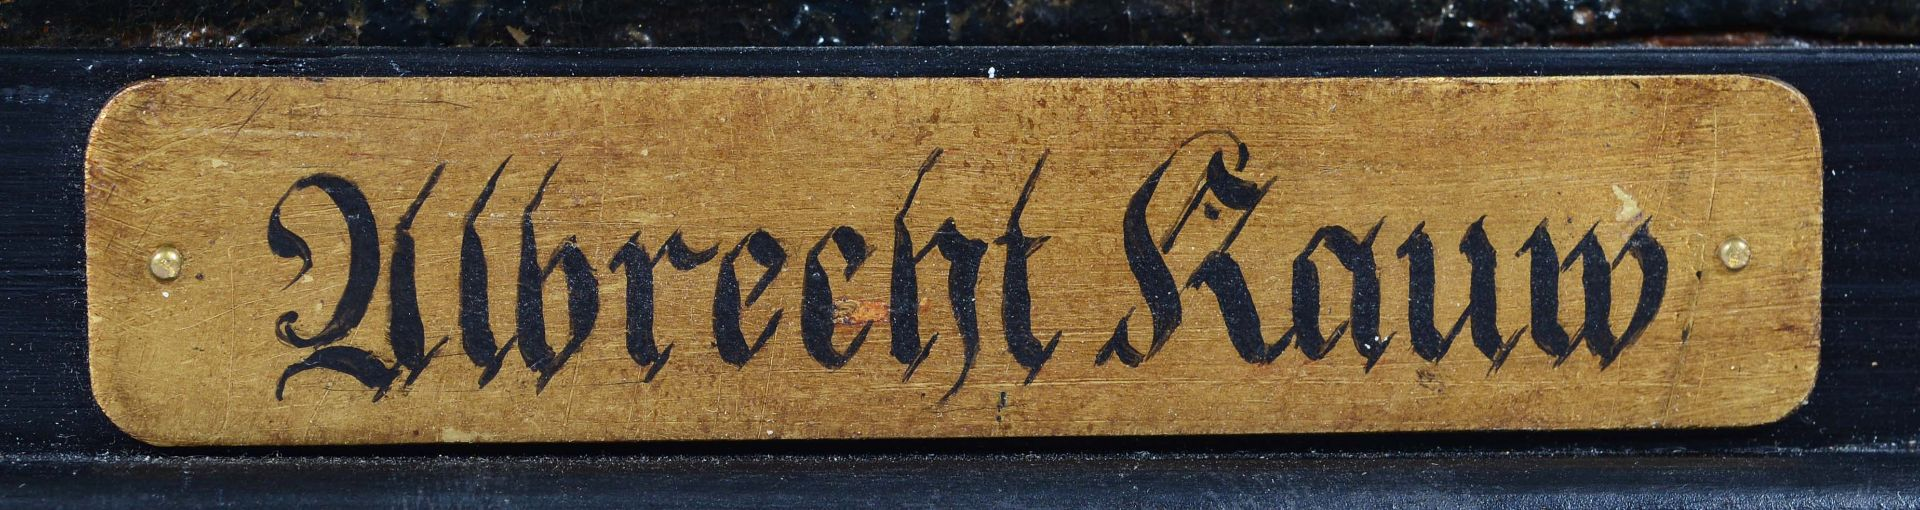 KAUW, ALBRECHT I: Die Seeschlacht. - Image 9 of 13